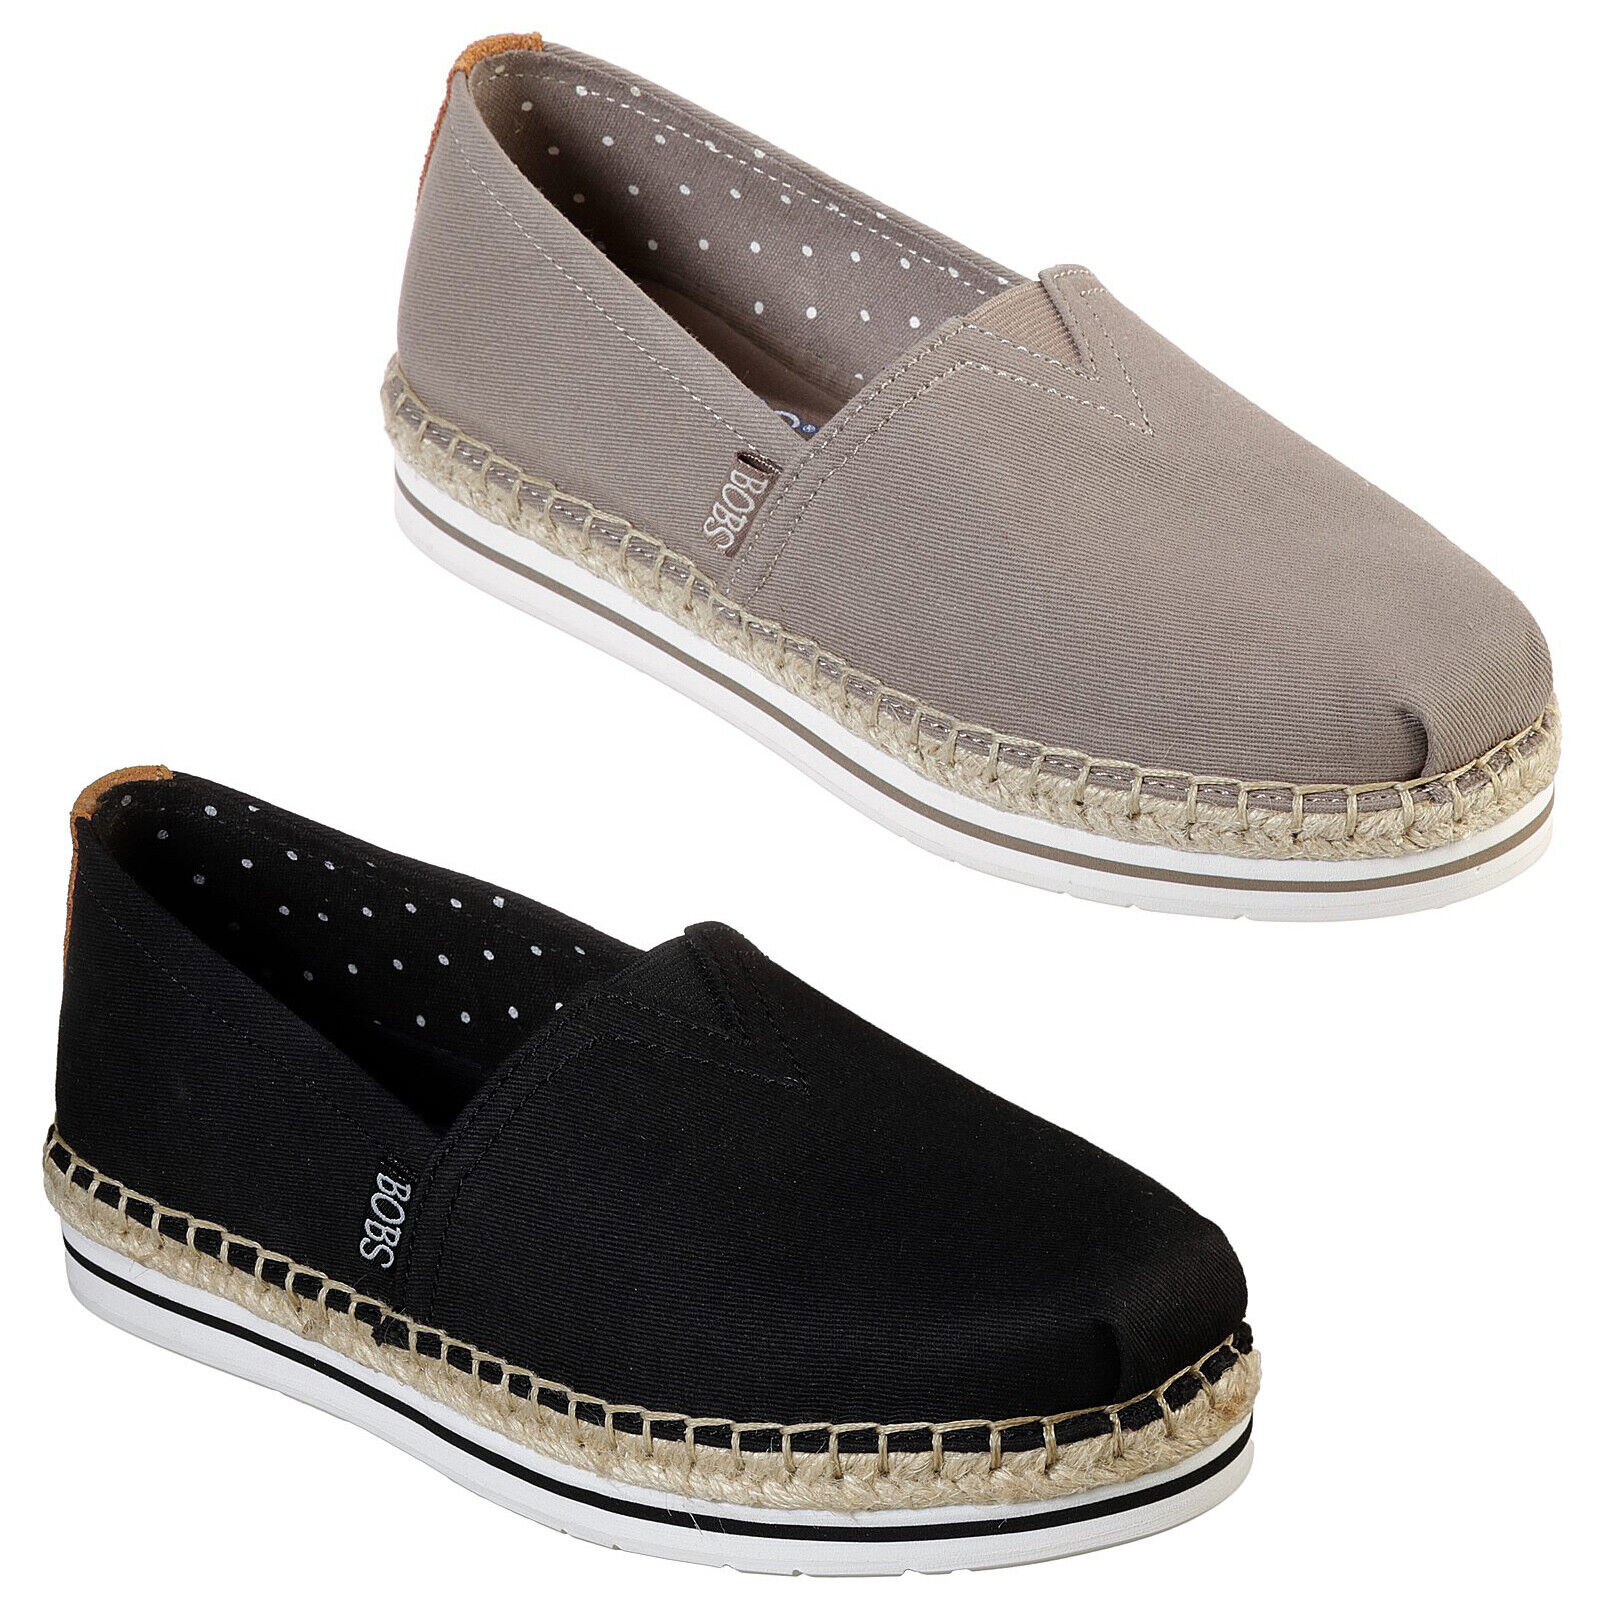 Skechers BOBS Breeze Shoes Womens